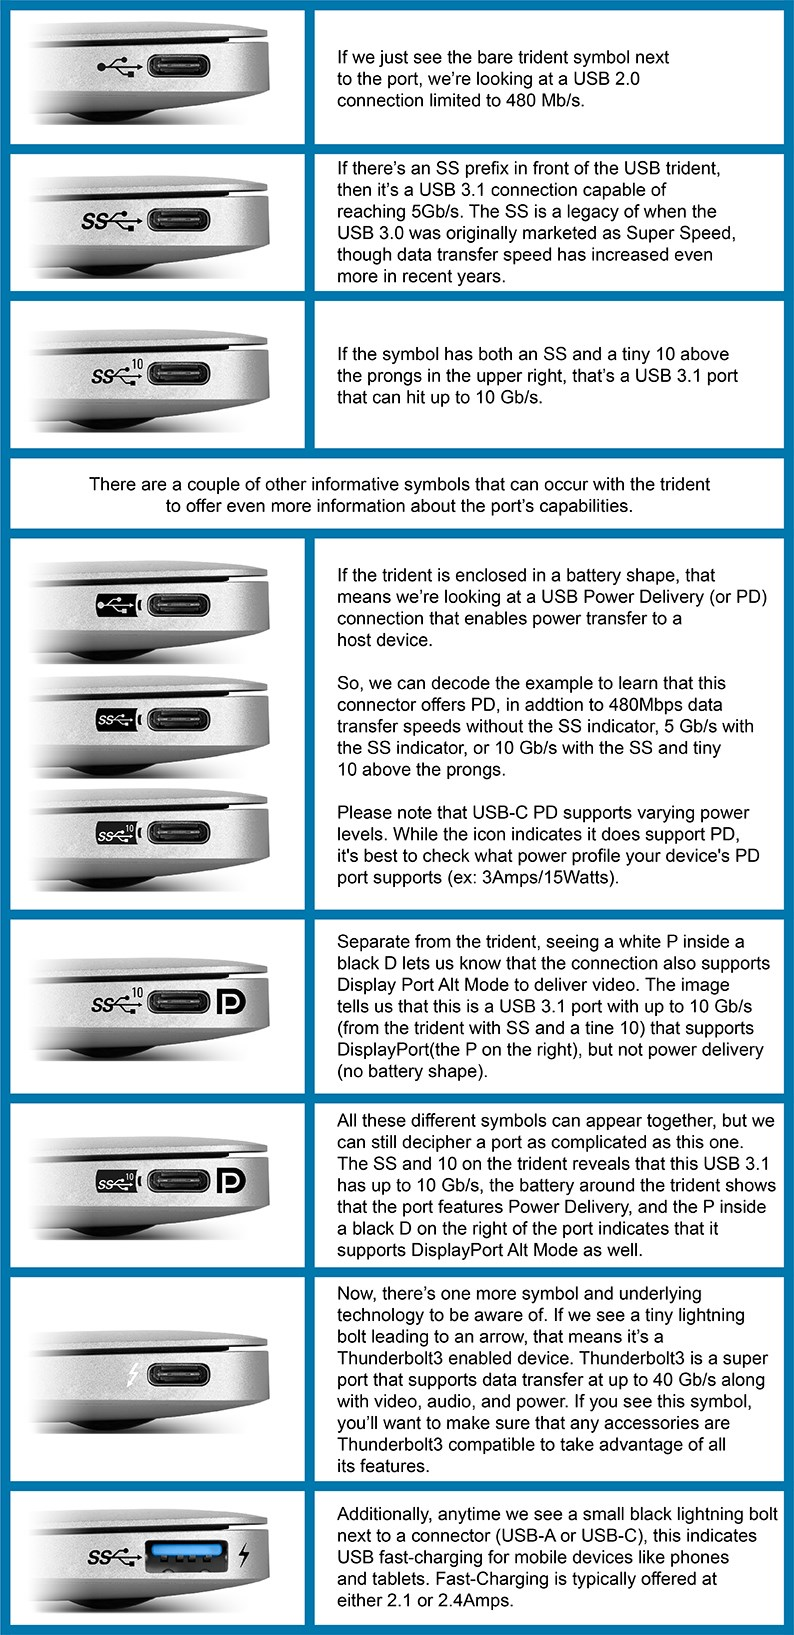 USB-C Demystified | Kensington